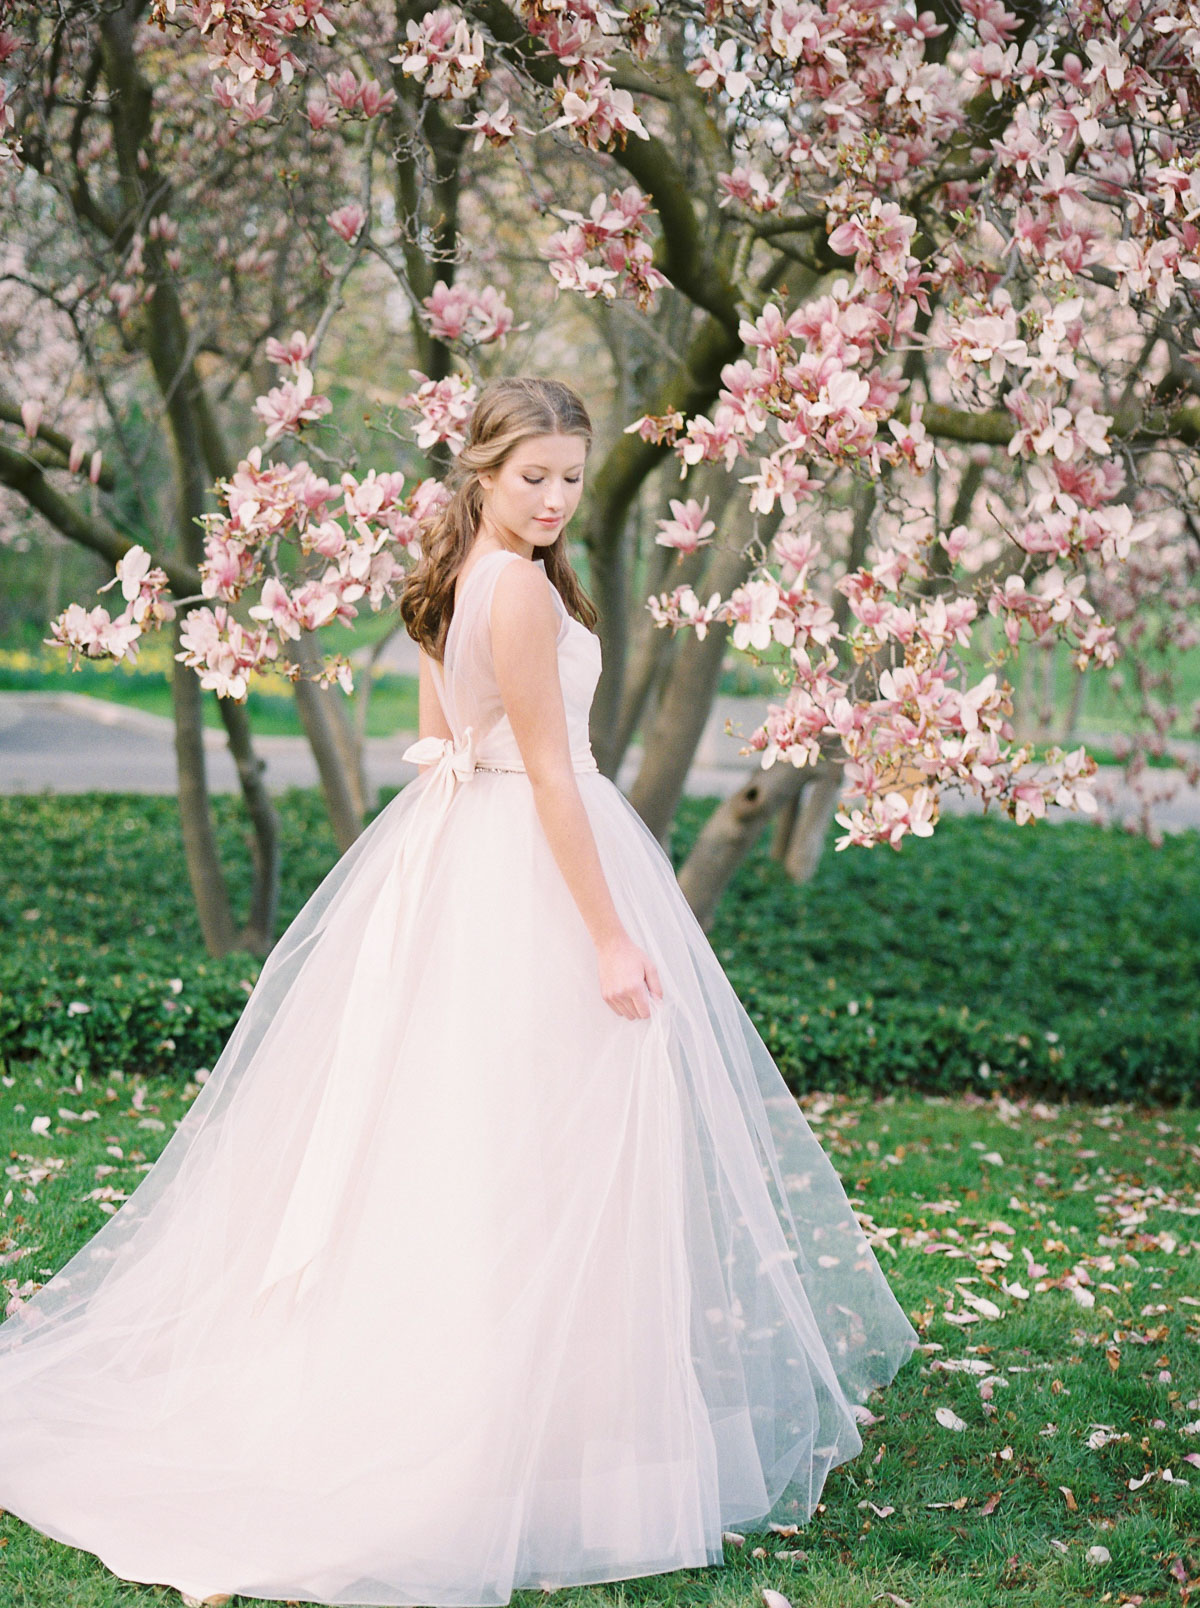 julia-park-photography-vineyard-bride-swish-list-niagara-on-the-lake-wedding-editorial-8.jpg